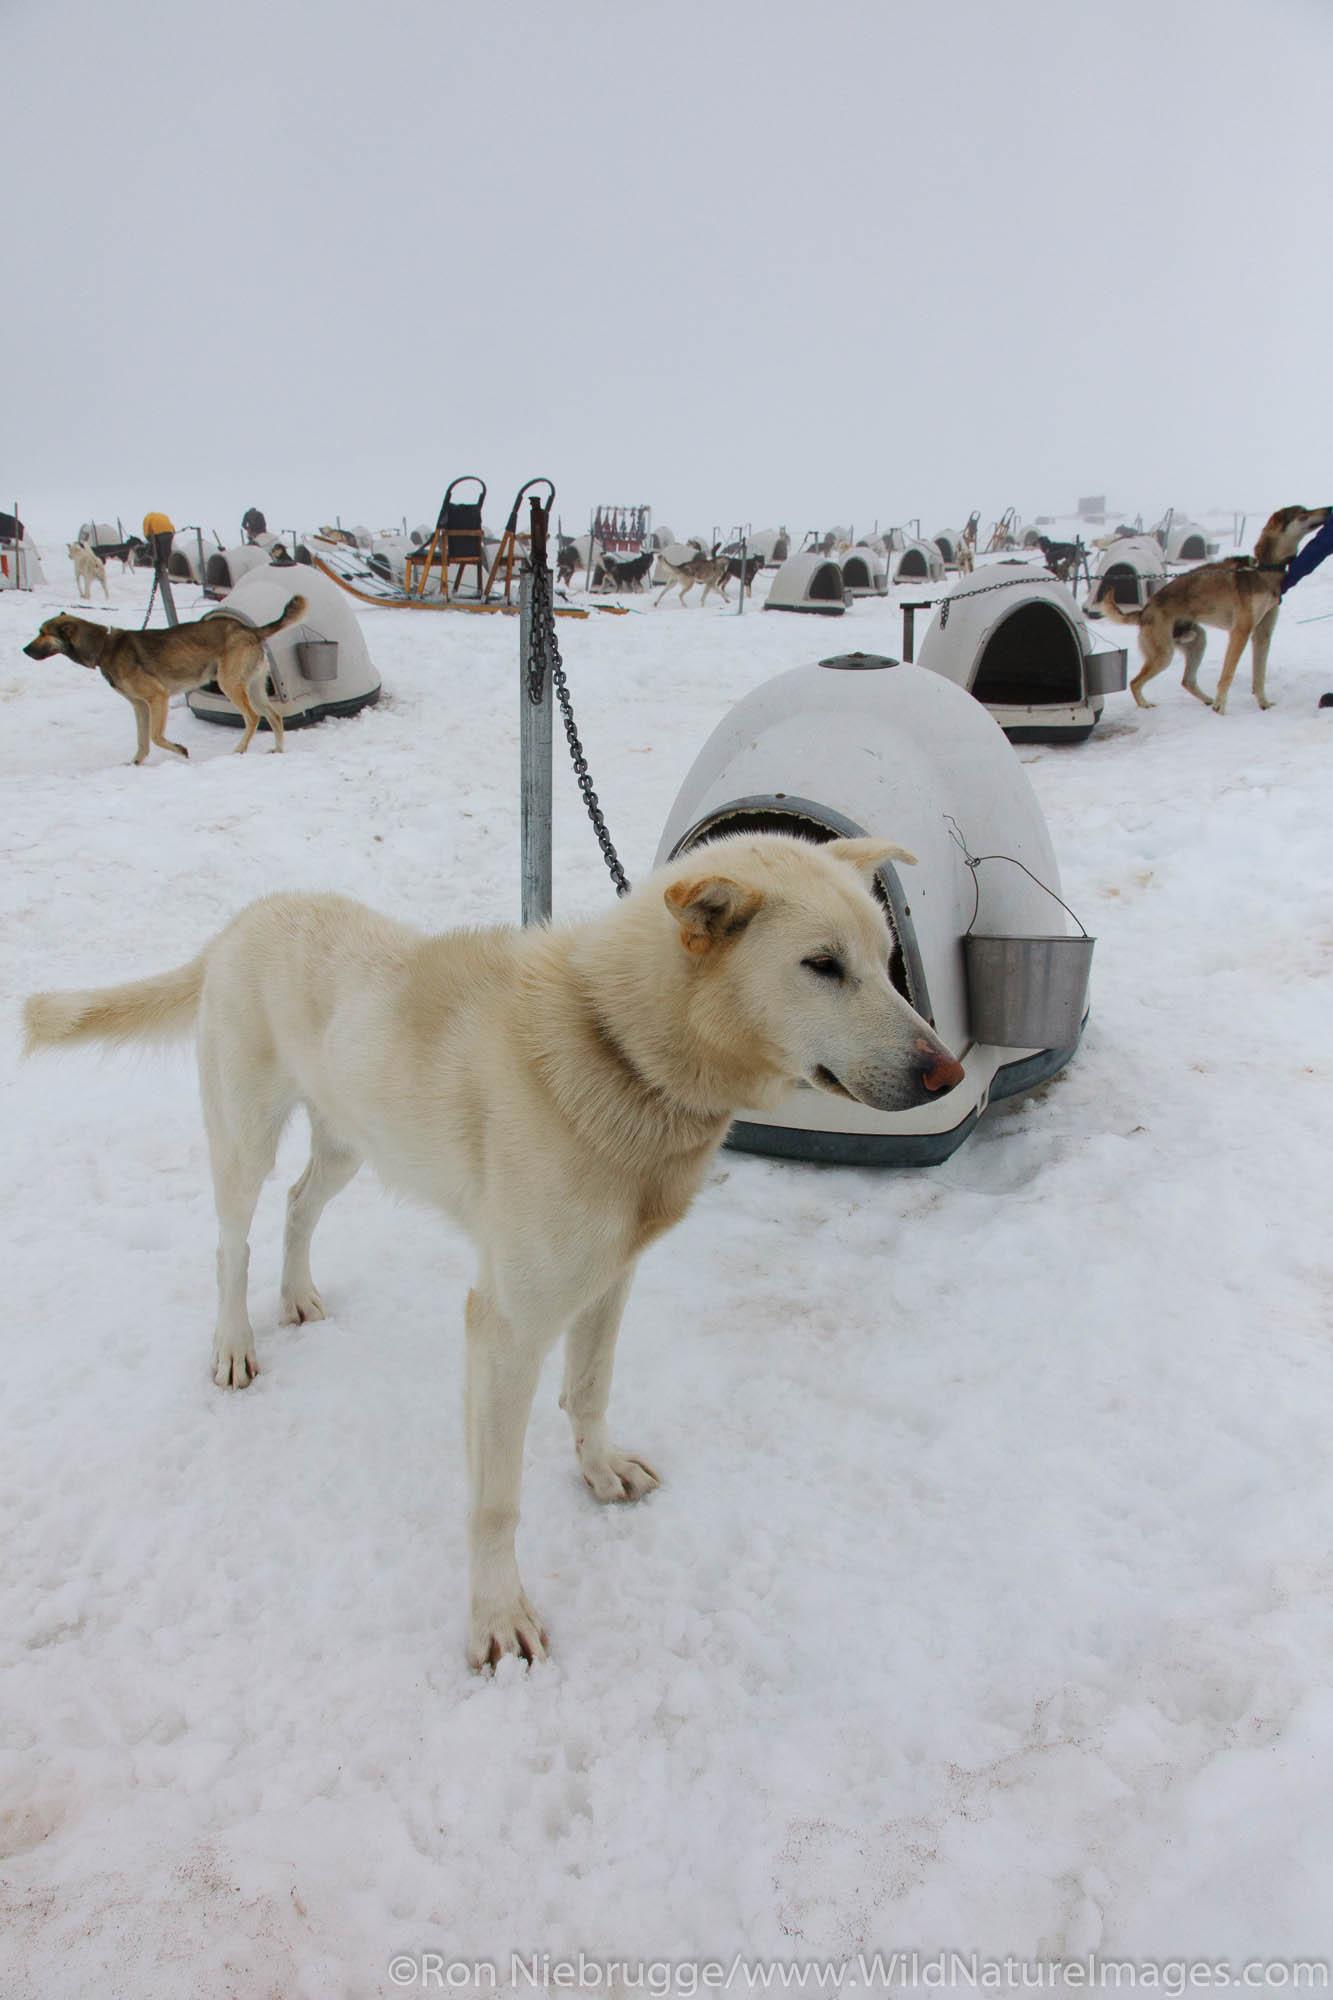 Sled dog tour on Punch Bowl Glacier, Chugach National Forest, near Girdwood, Alaska.